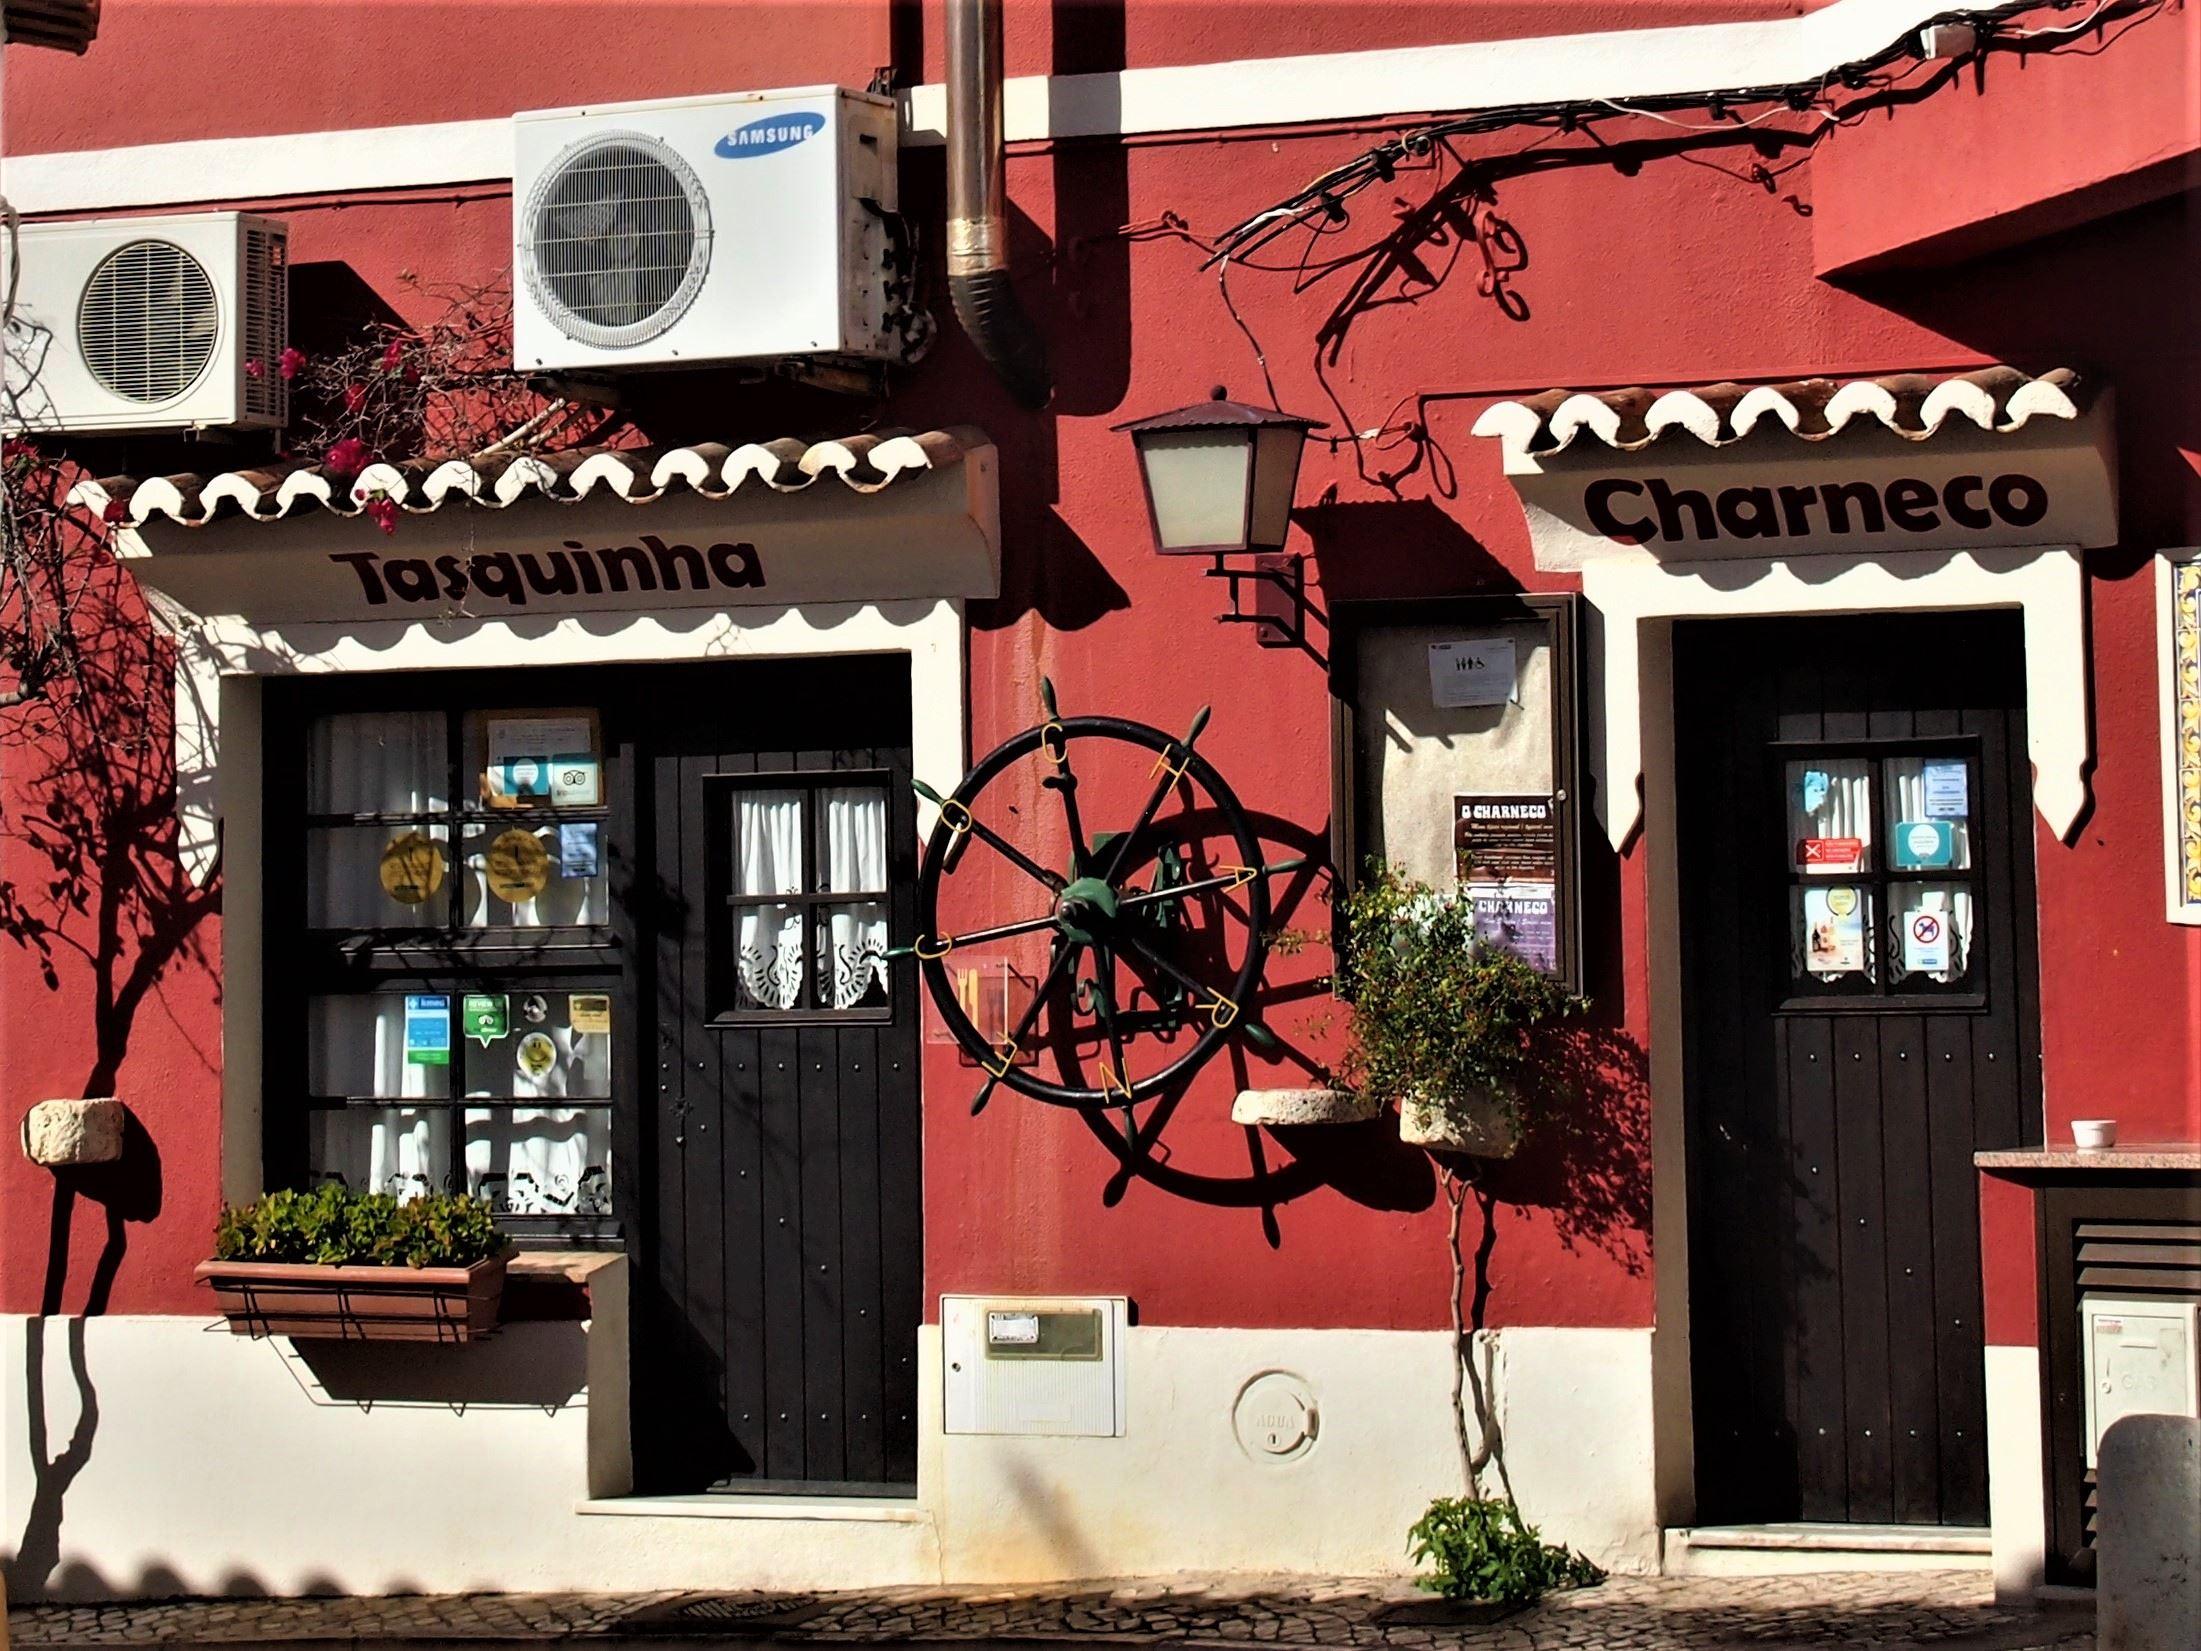 O Charneco restaurant at Estombar, Algarve